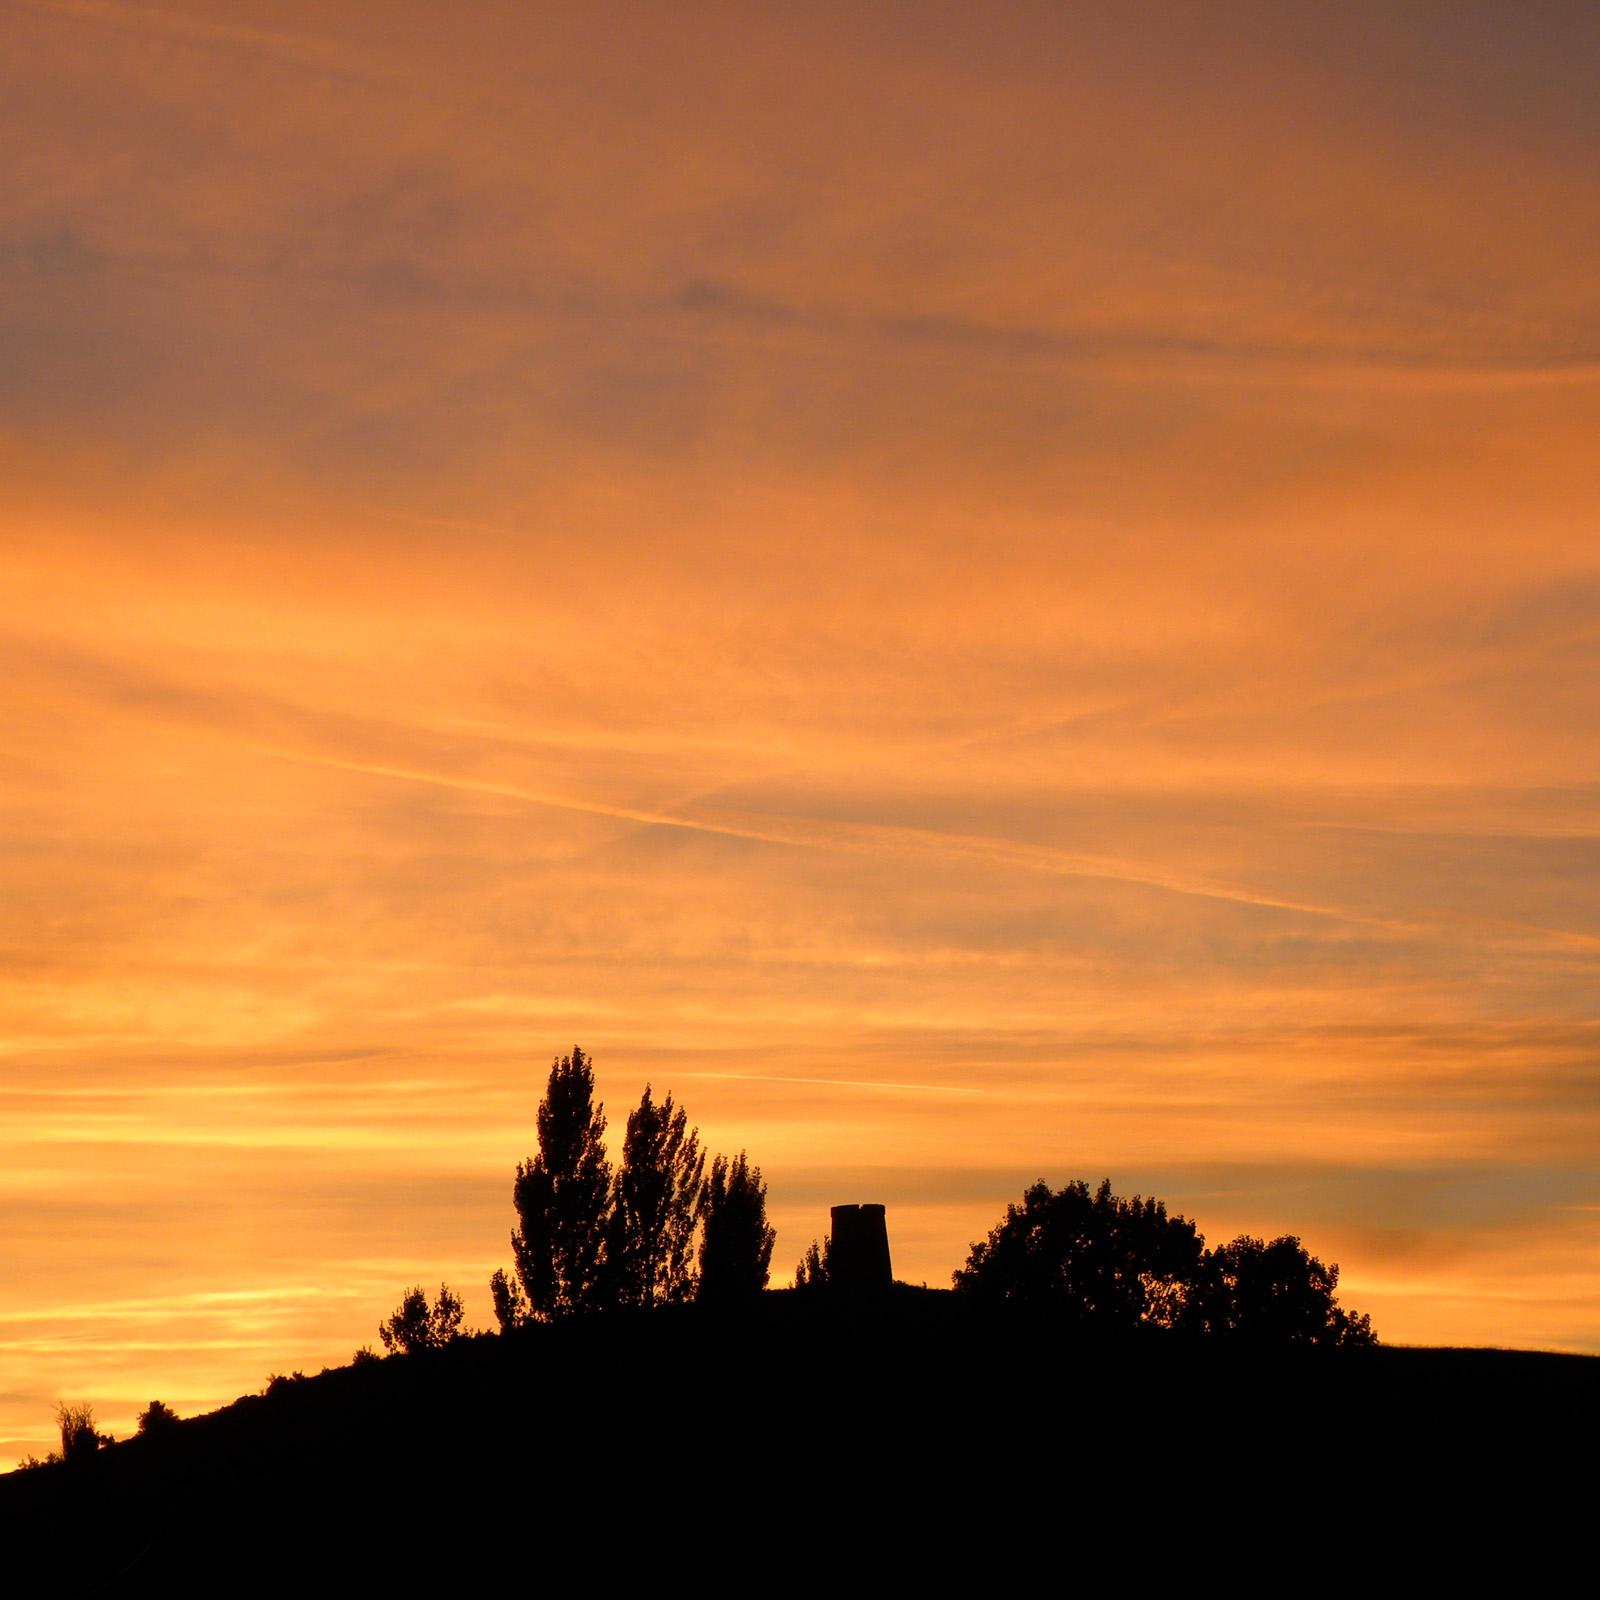 Spirituele vakantie Frankrijk, prachtige avond gloed